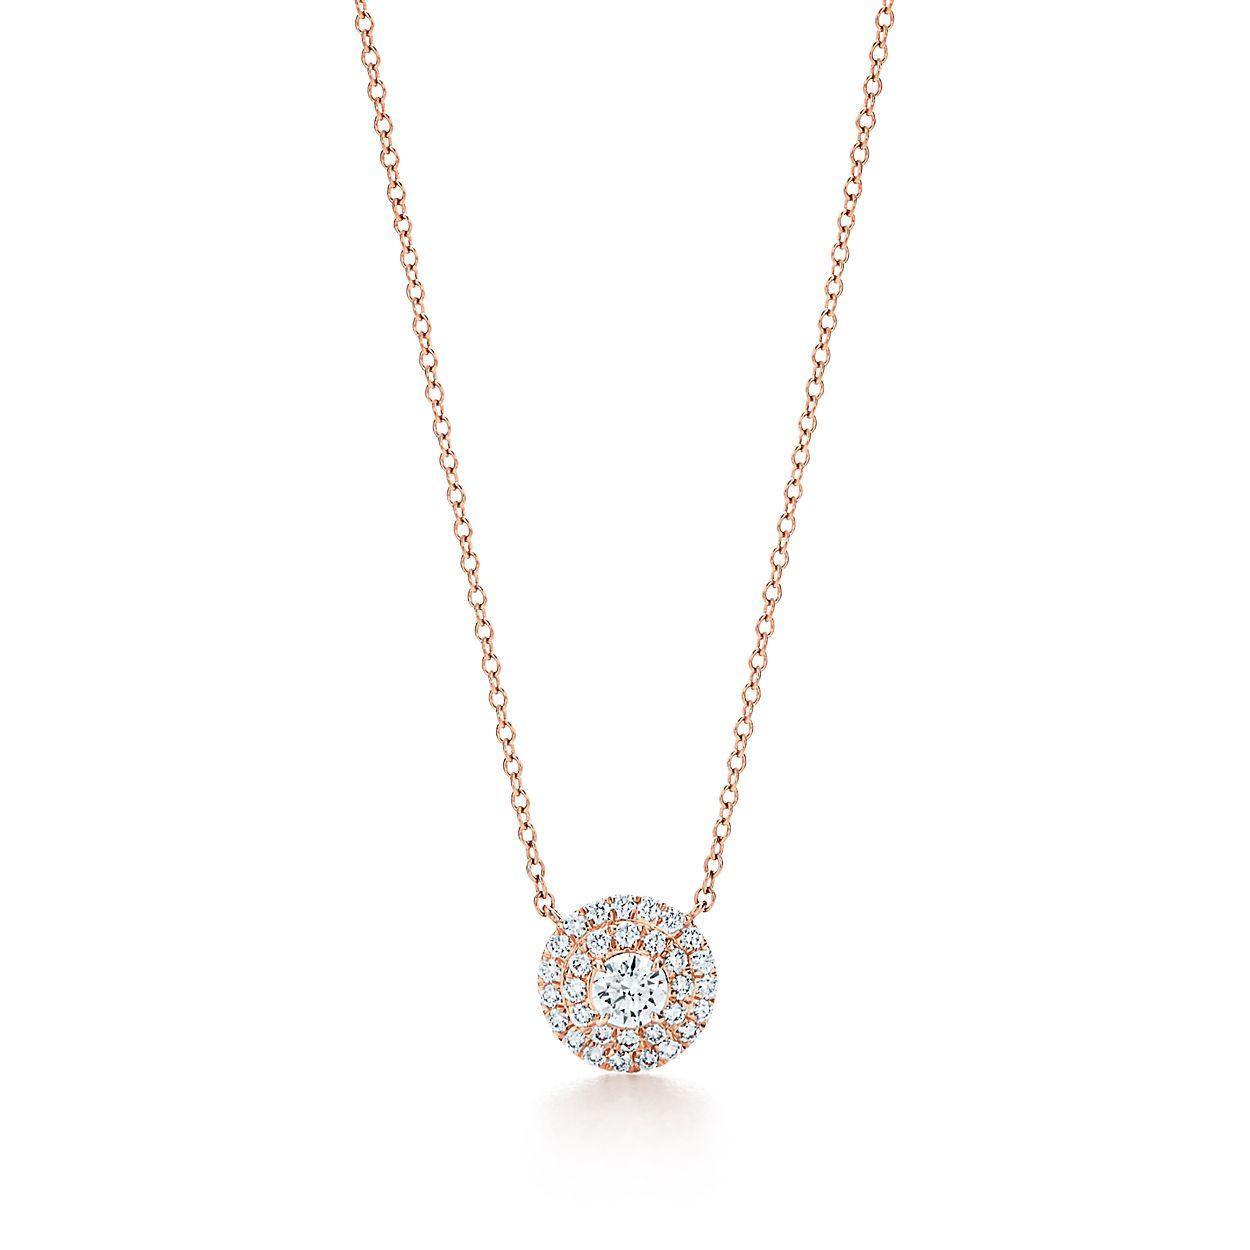 Pendentif Tiffany Soleste® en or rose 18 carats et diamants ... 8ab57095938b